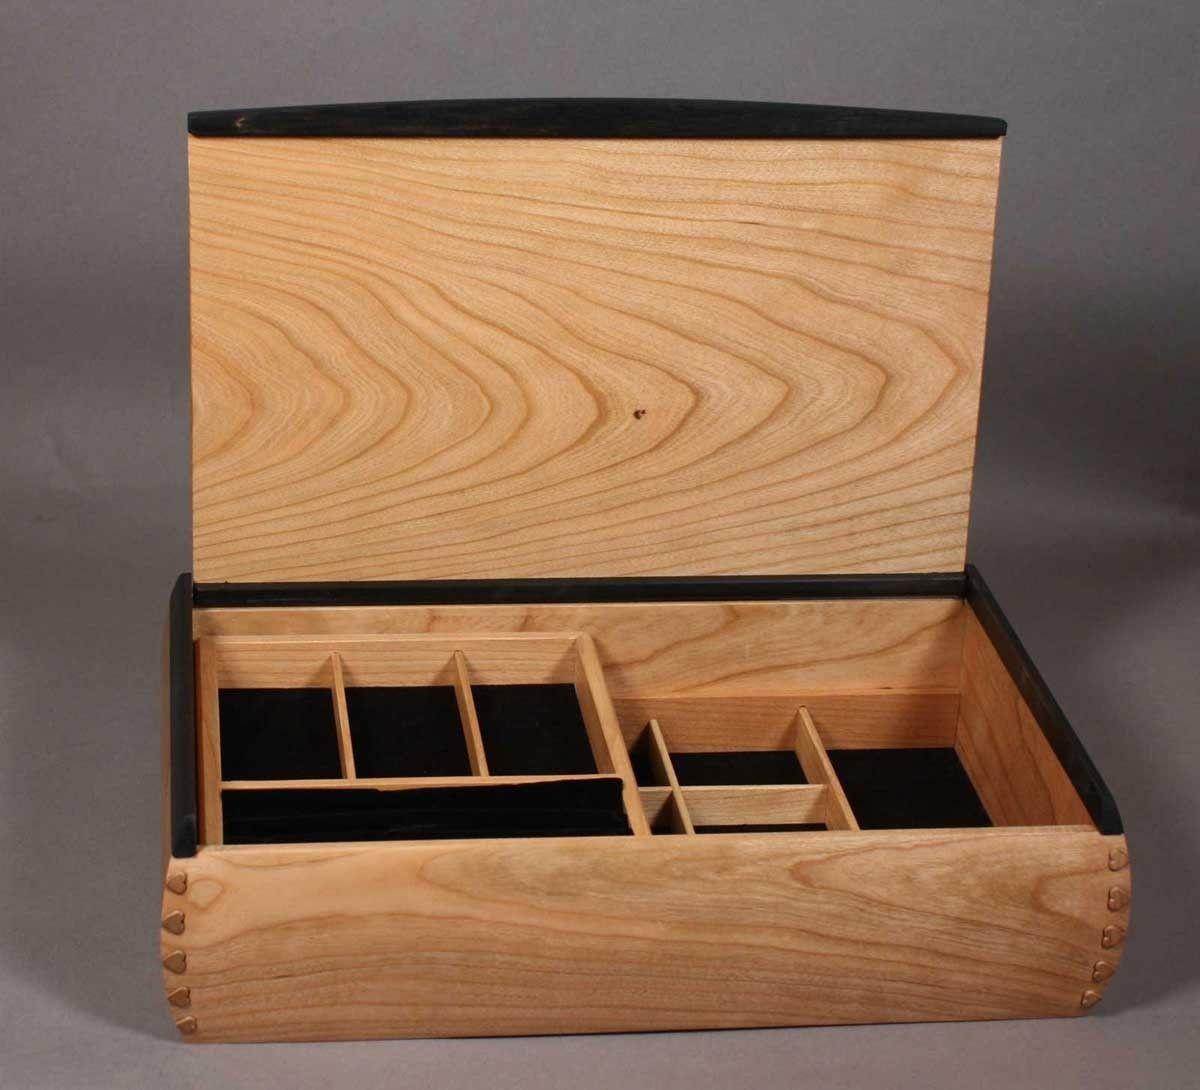 Custom Made Dovetailed Jewelry Box Boxes Pinterest Box